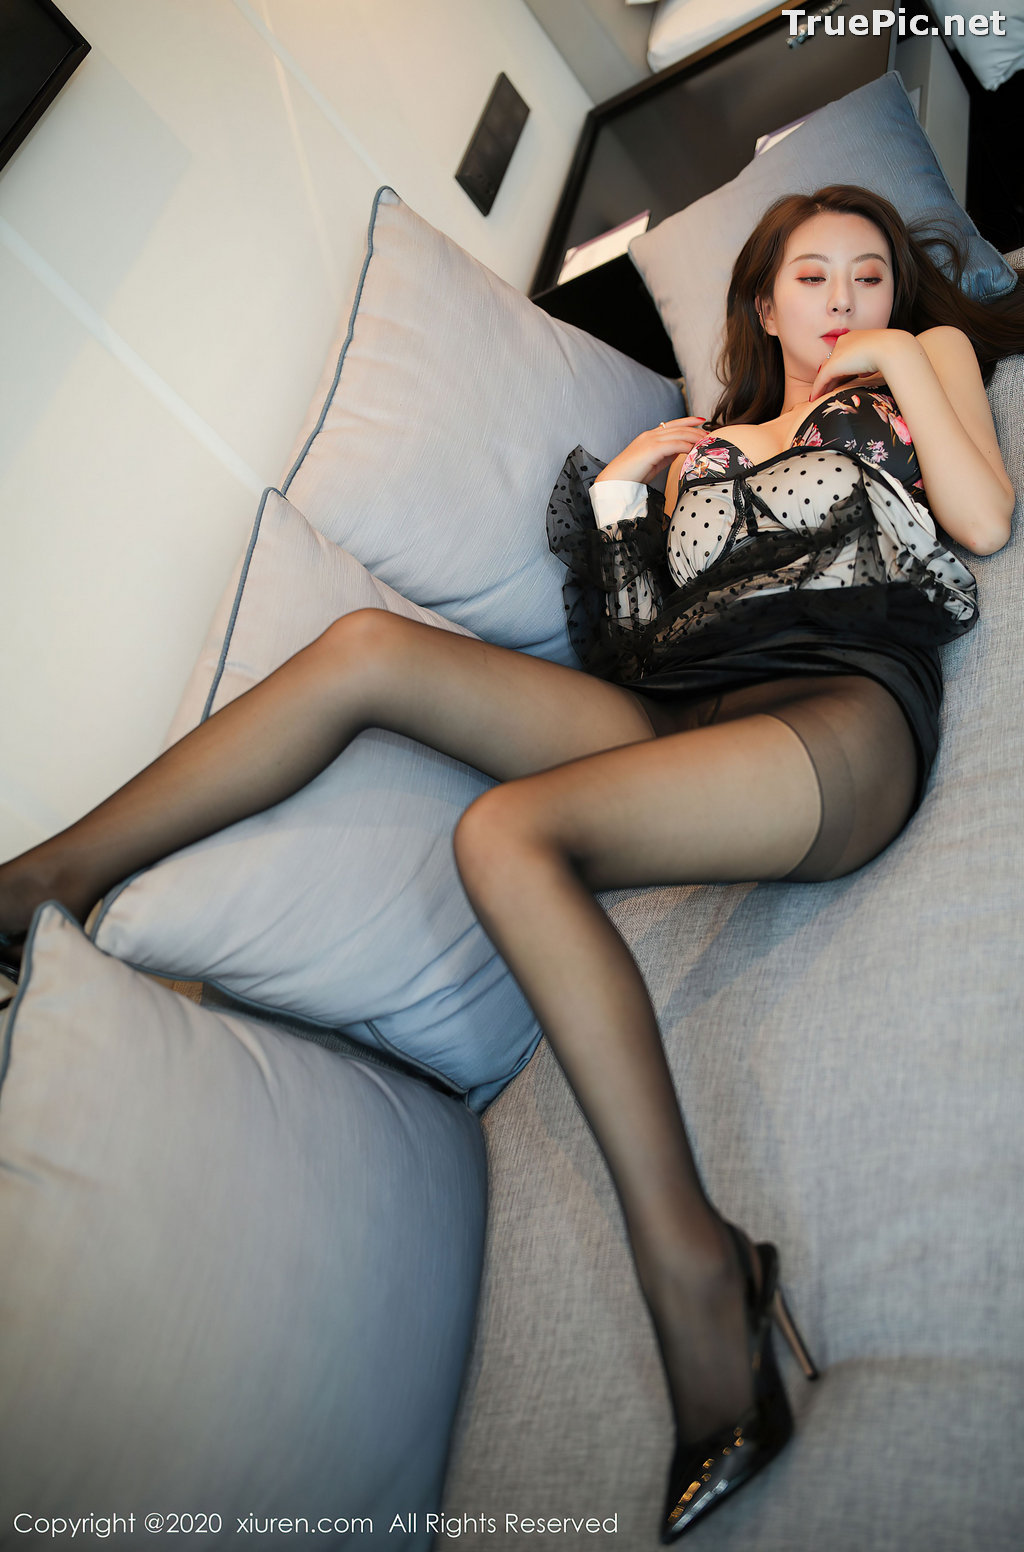 Image XIUREN No.2650 - Chinese Model - 李夫人 - Floral Lingerie - TruePic.net - Picture-4